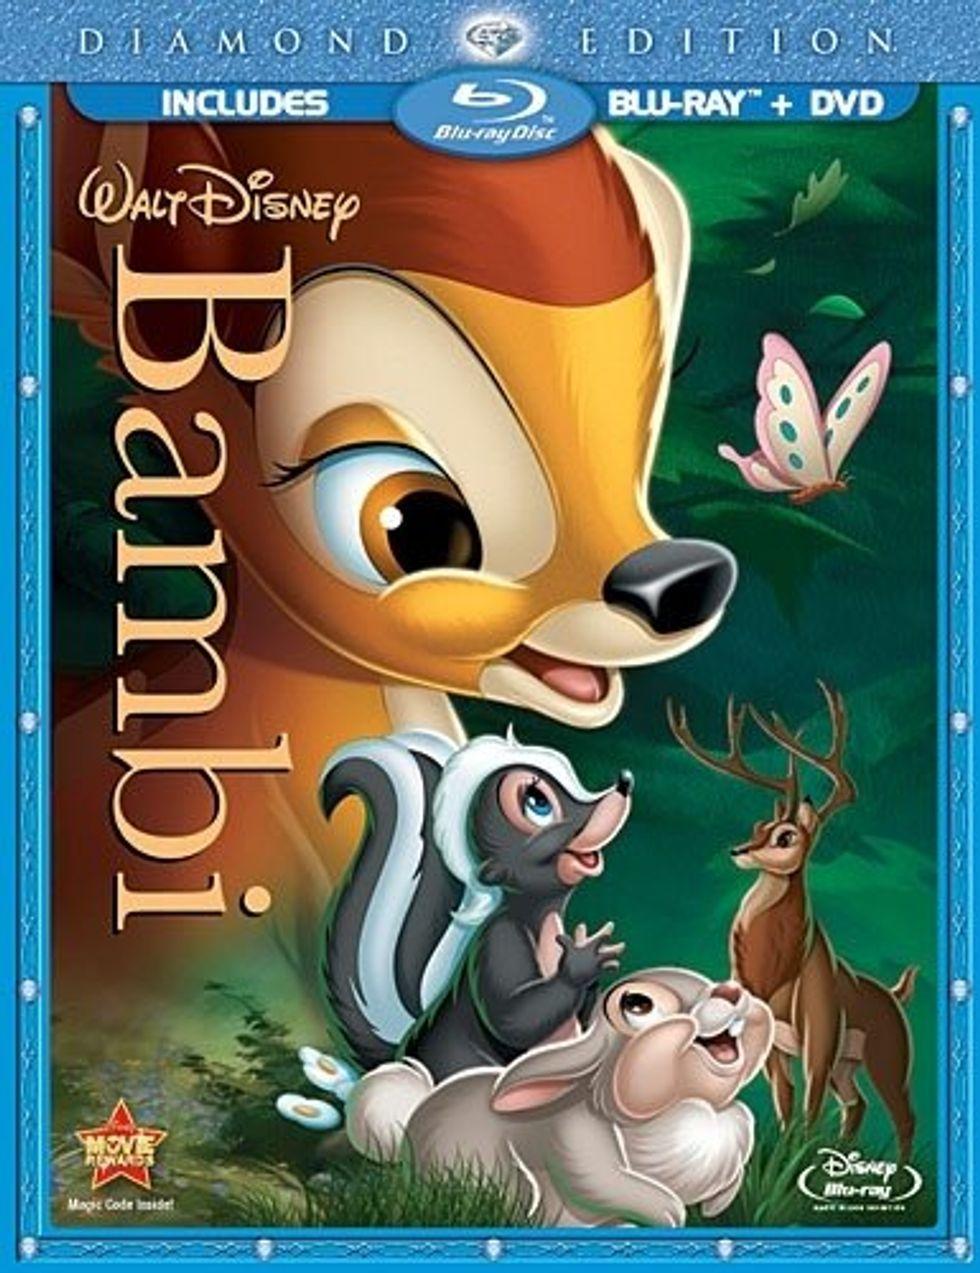 Bambi On Blu-ray and DVD Combo